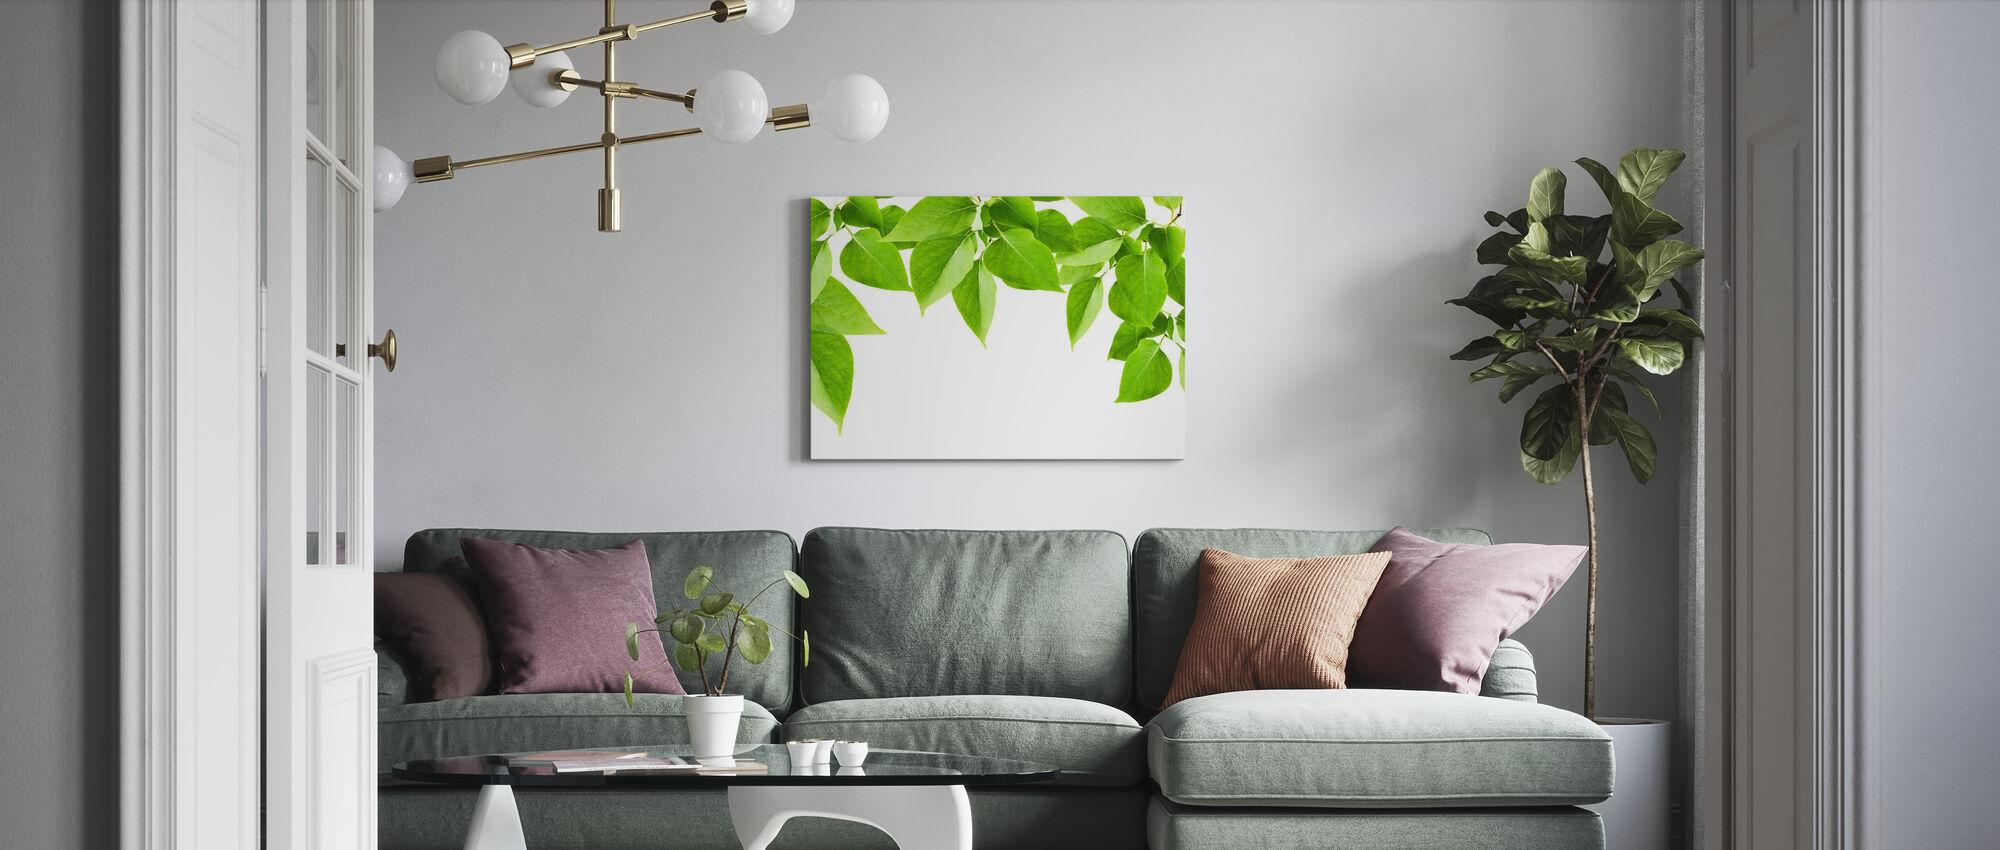 Groene bladeren Frame - Canvas print - Woonkamer